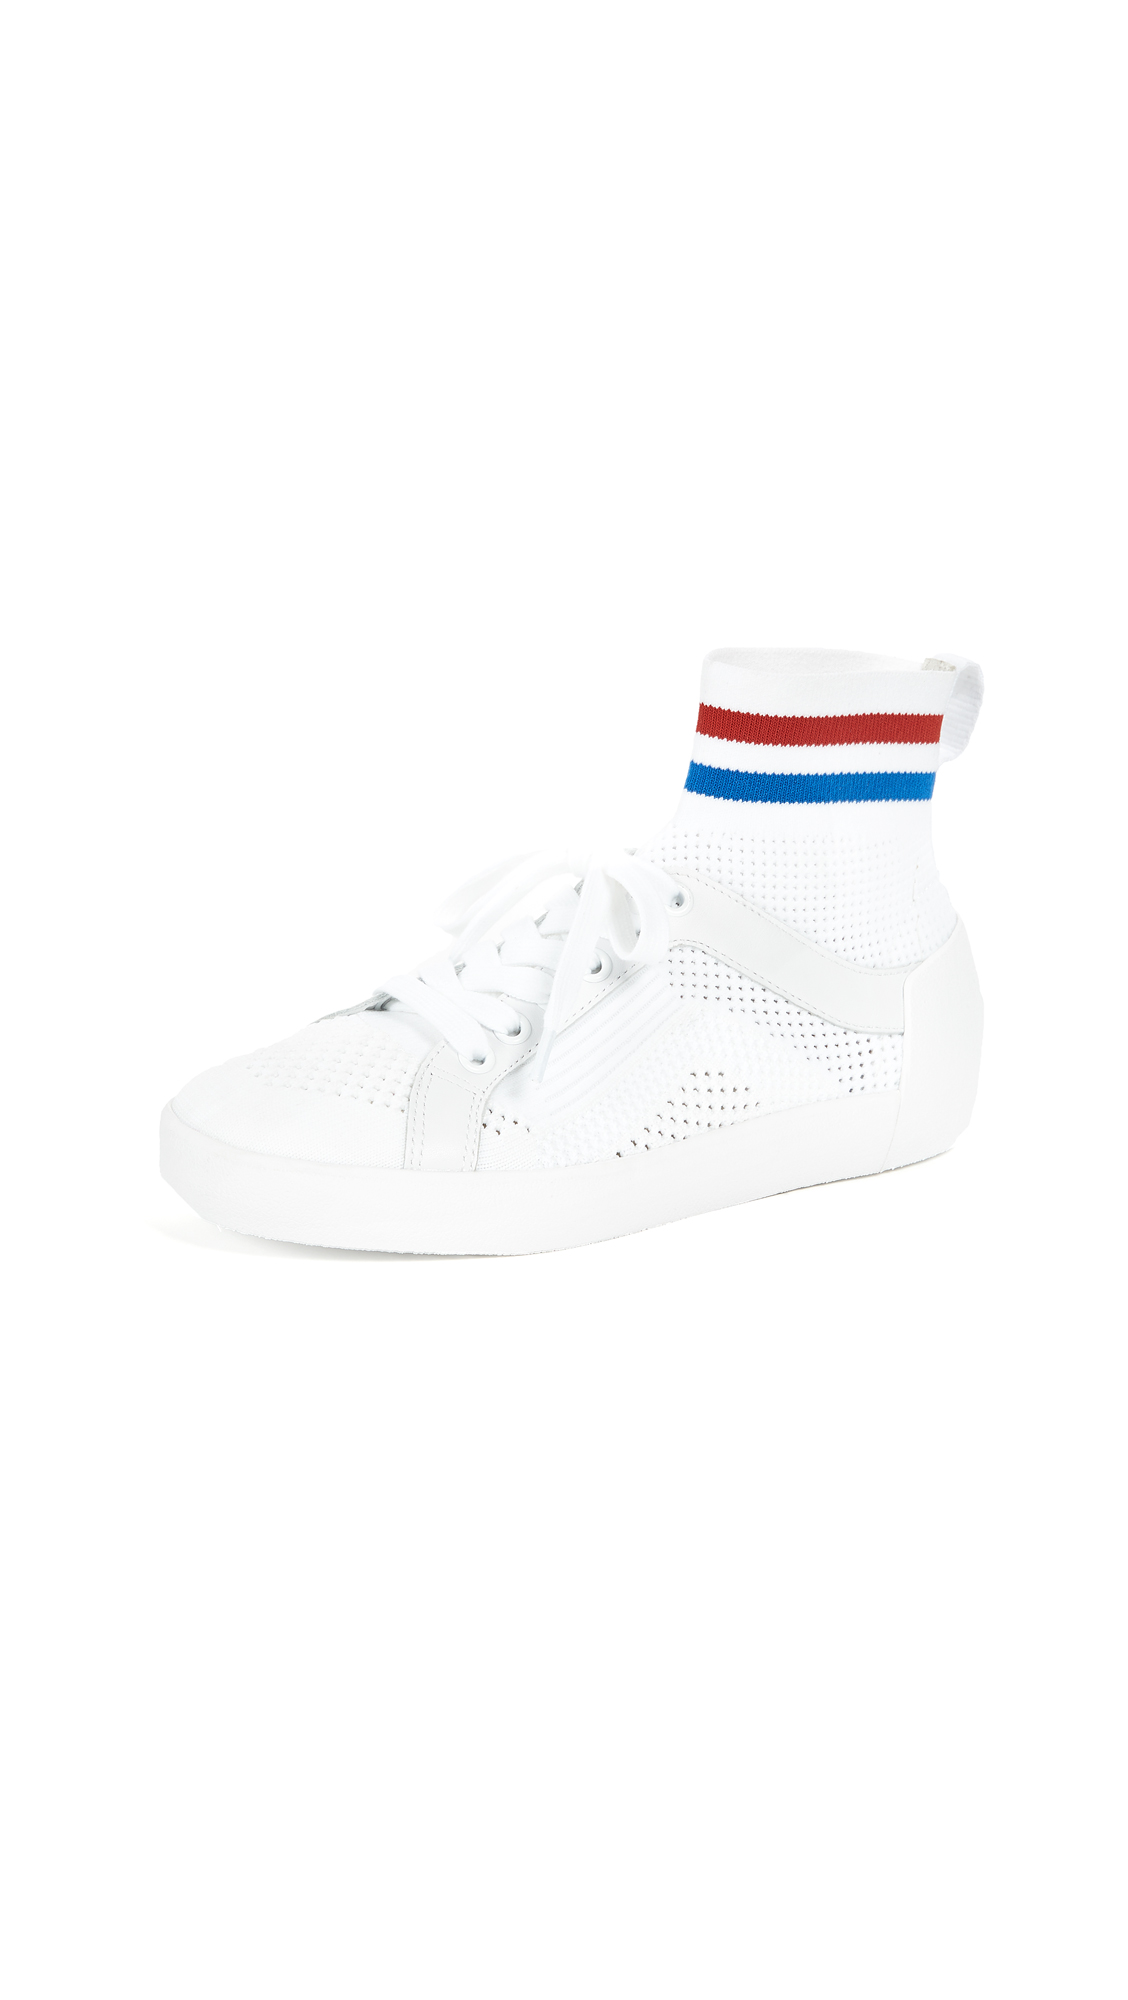 Ash Ninja Sneakers - White/Red/Blue